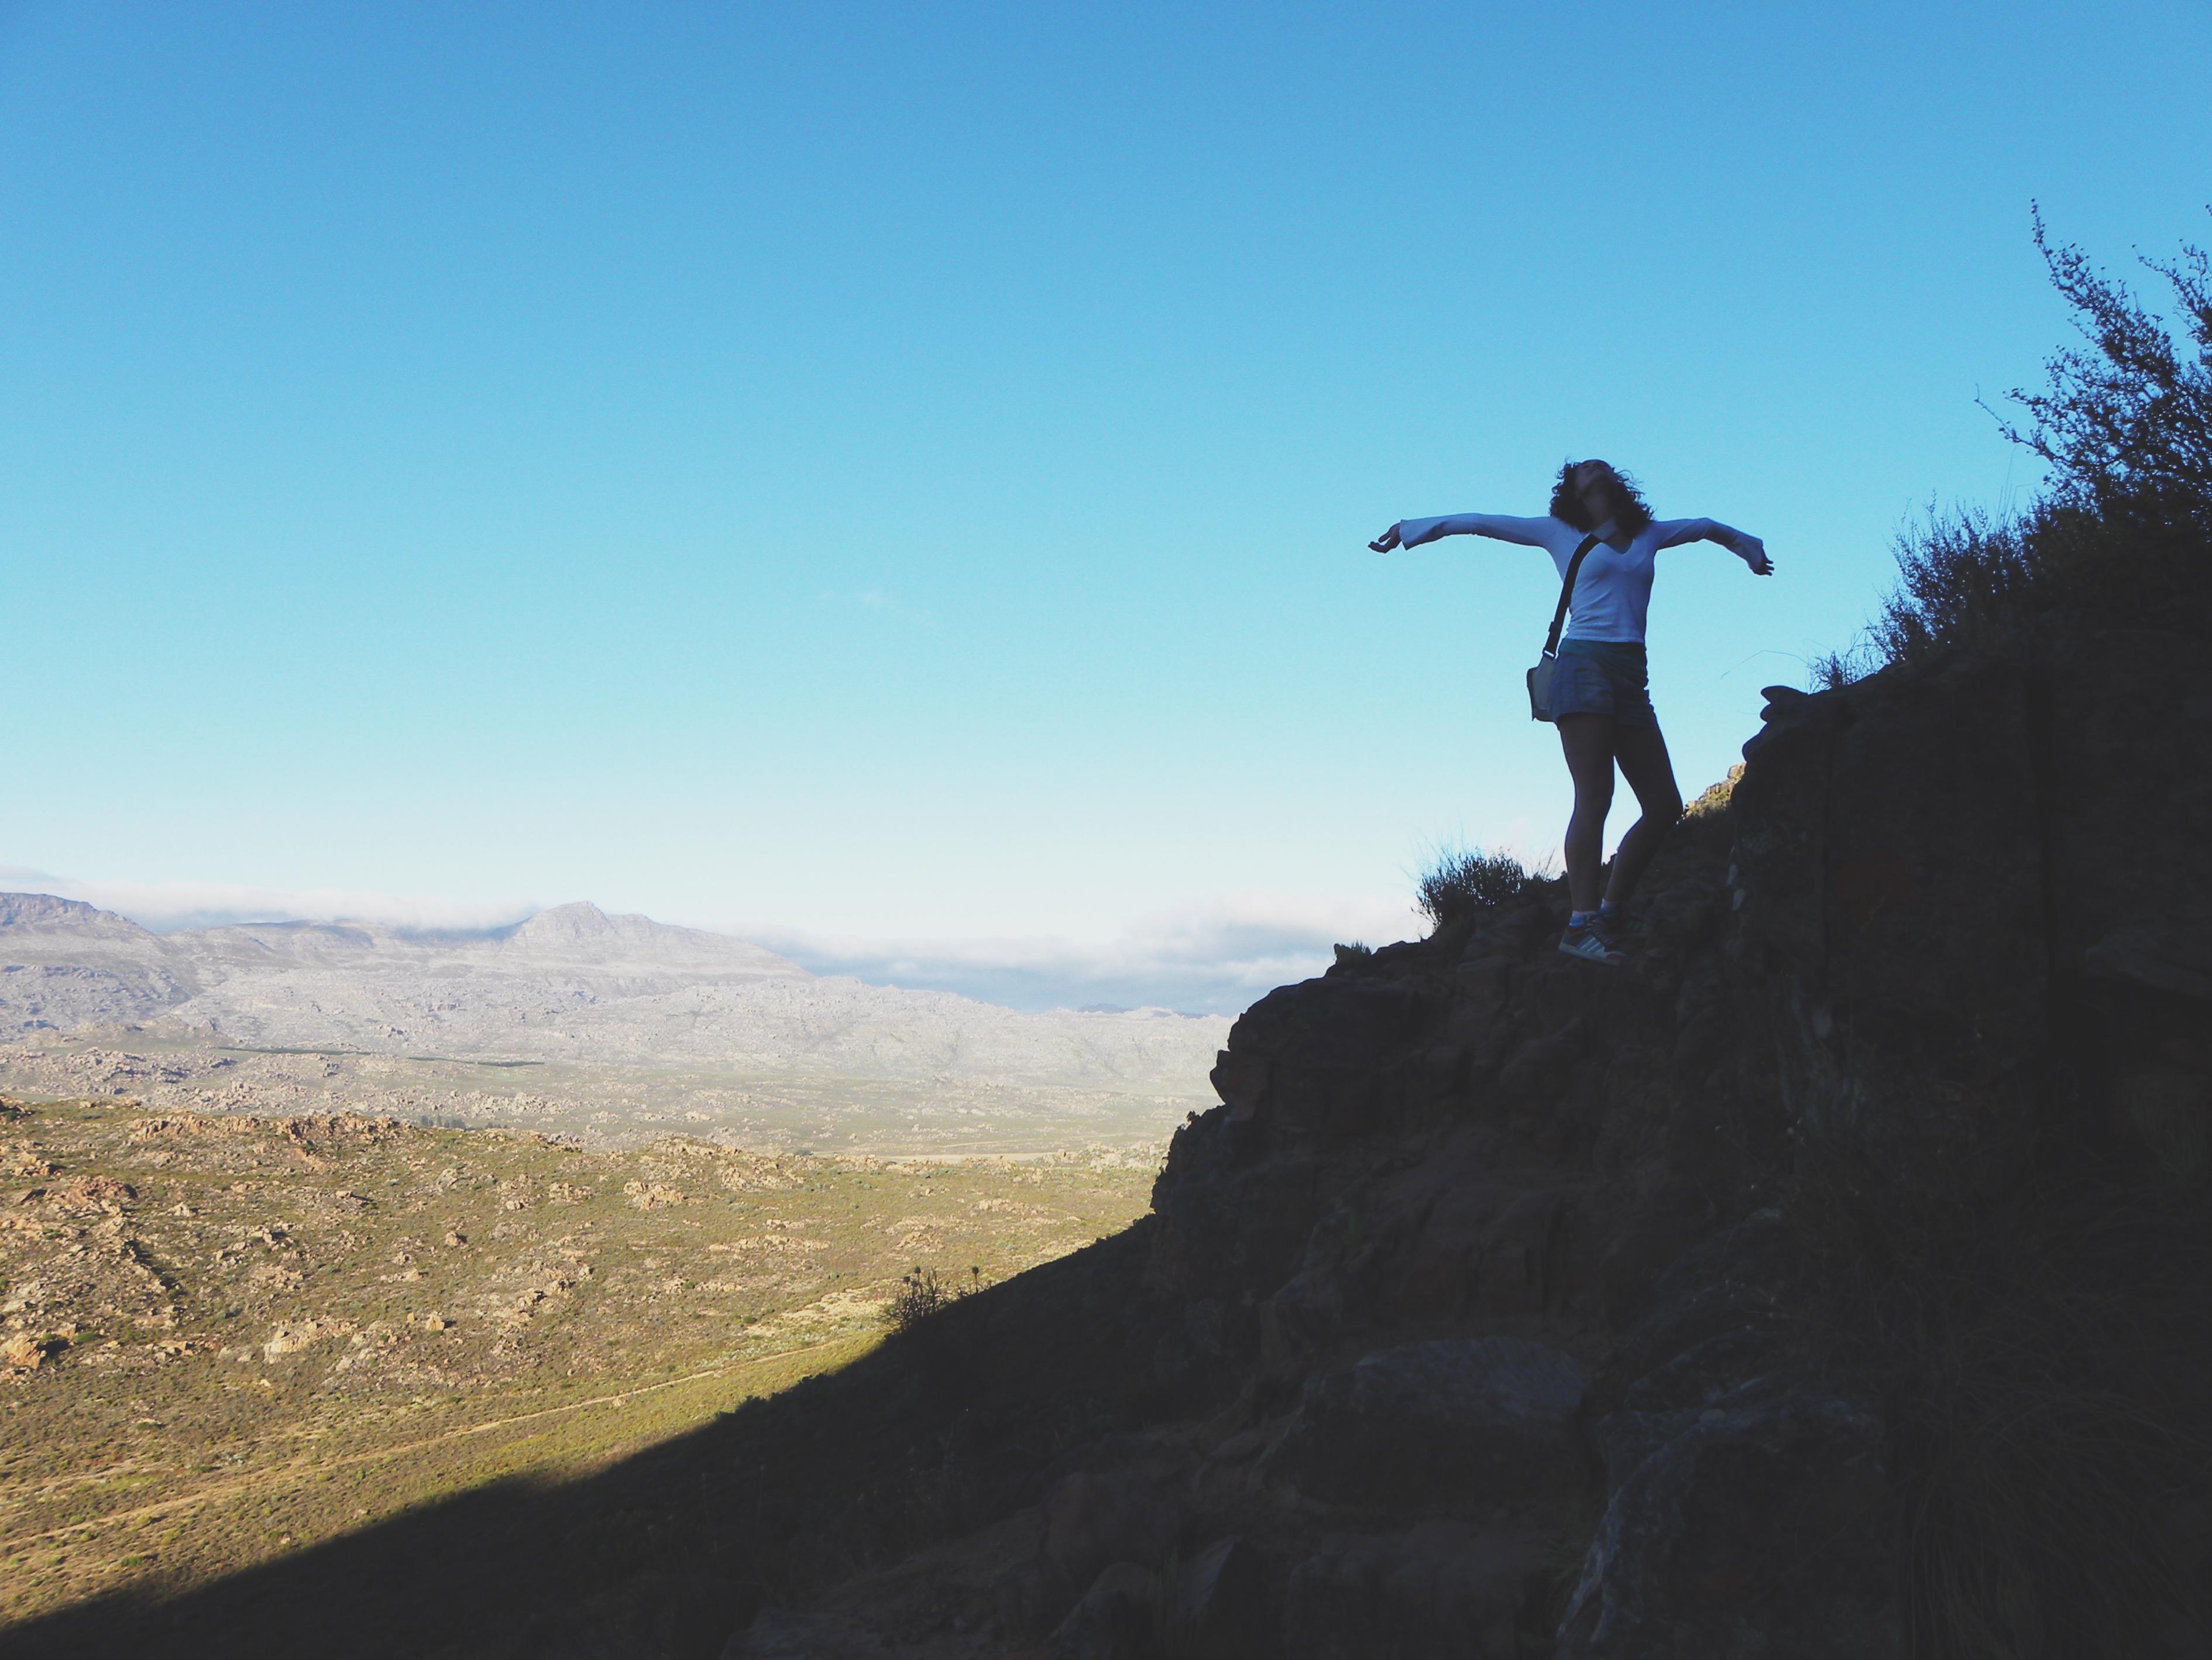 Travel Diary Sederbergen Zuid-Afrika 15